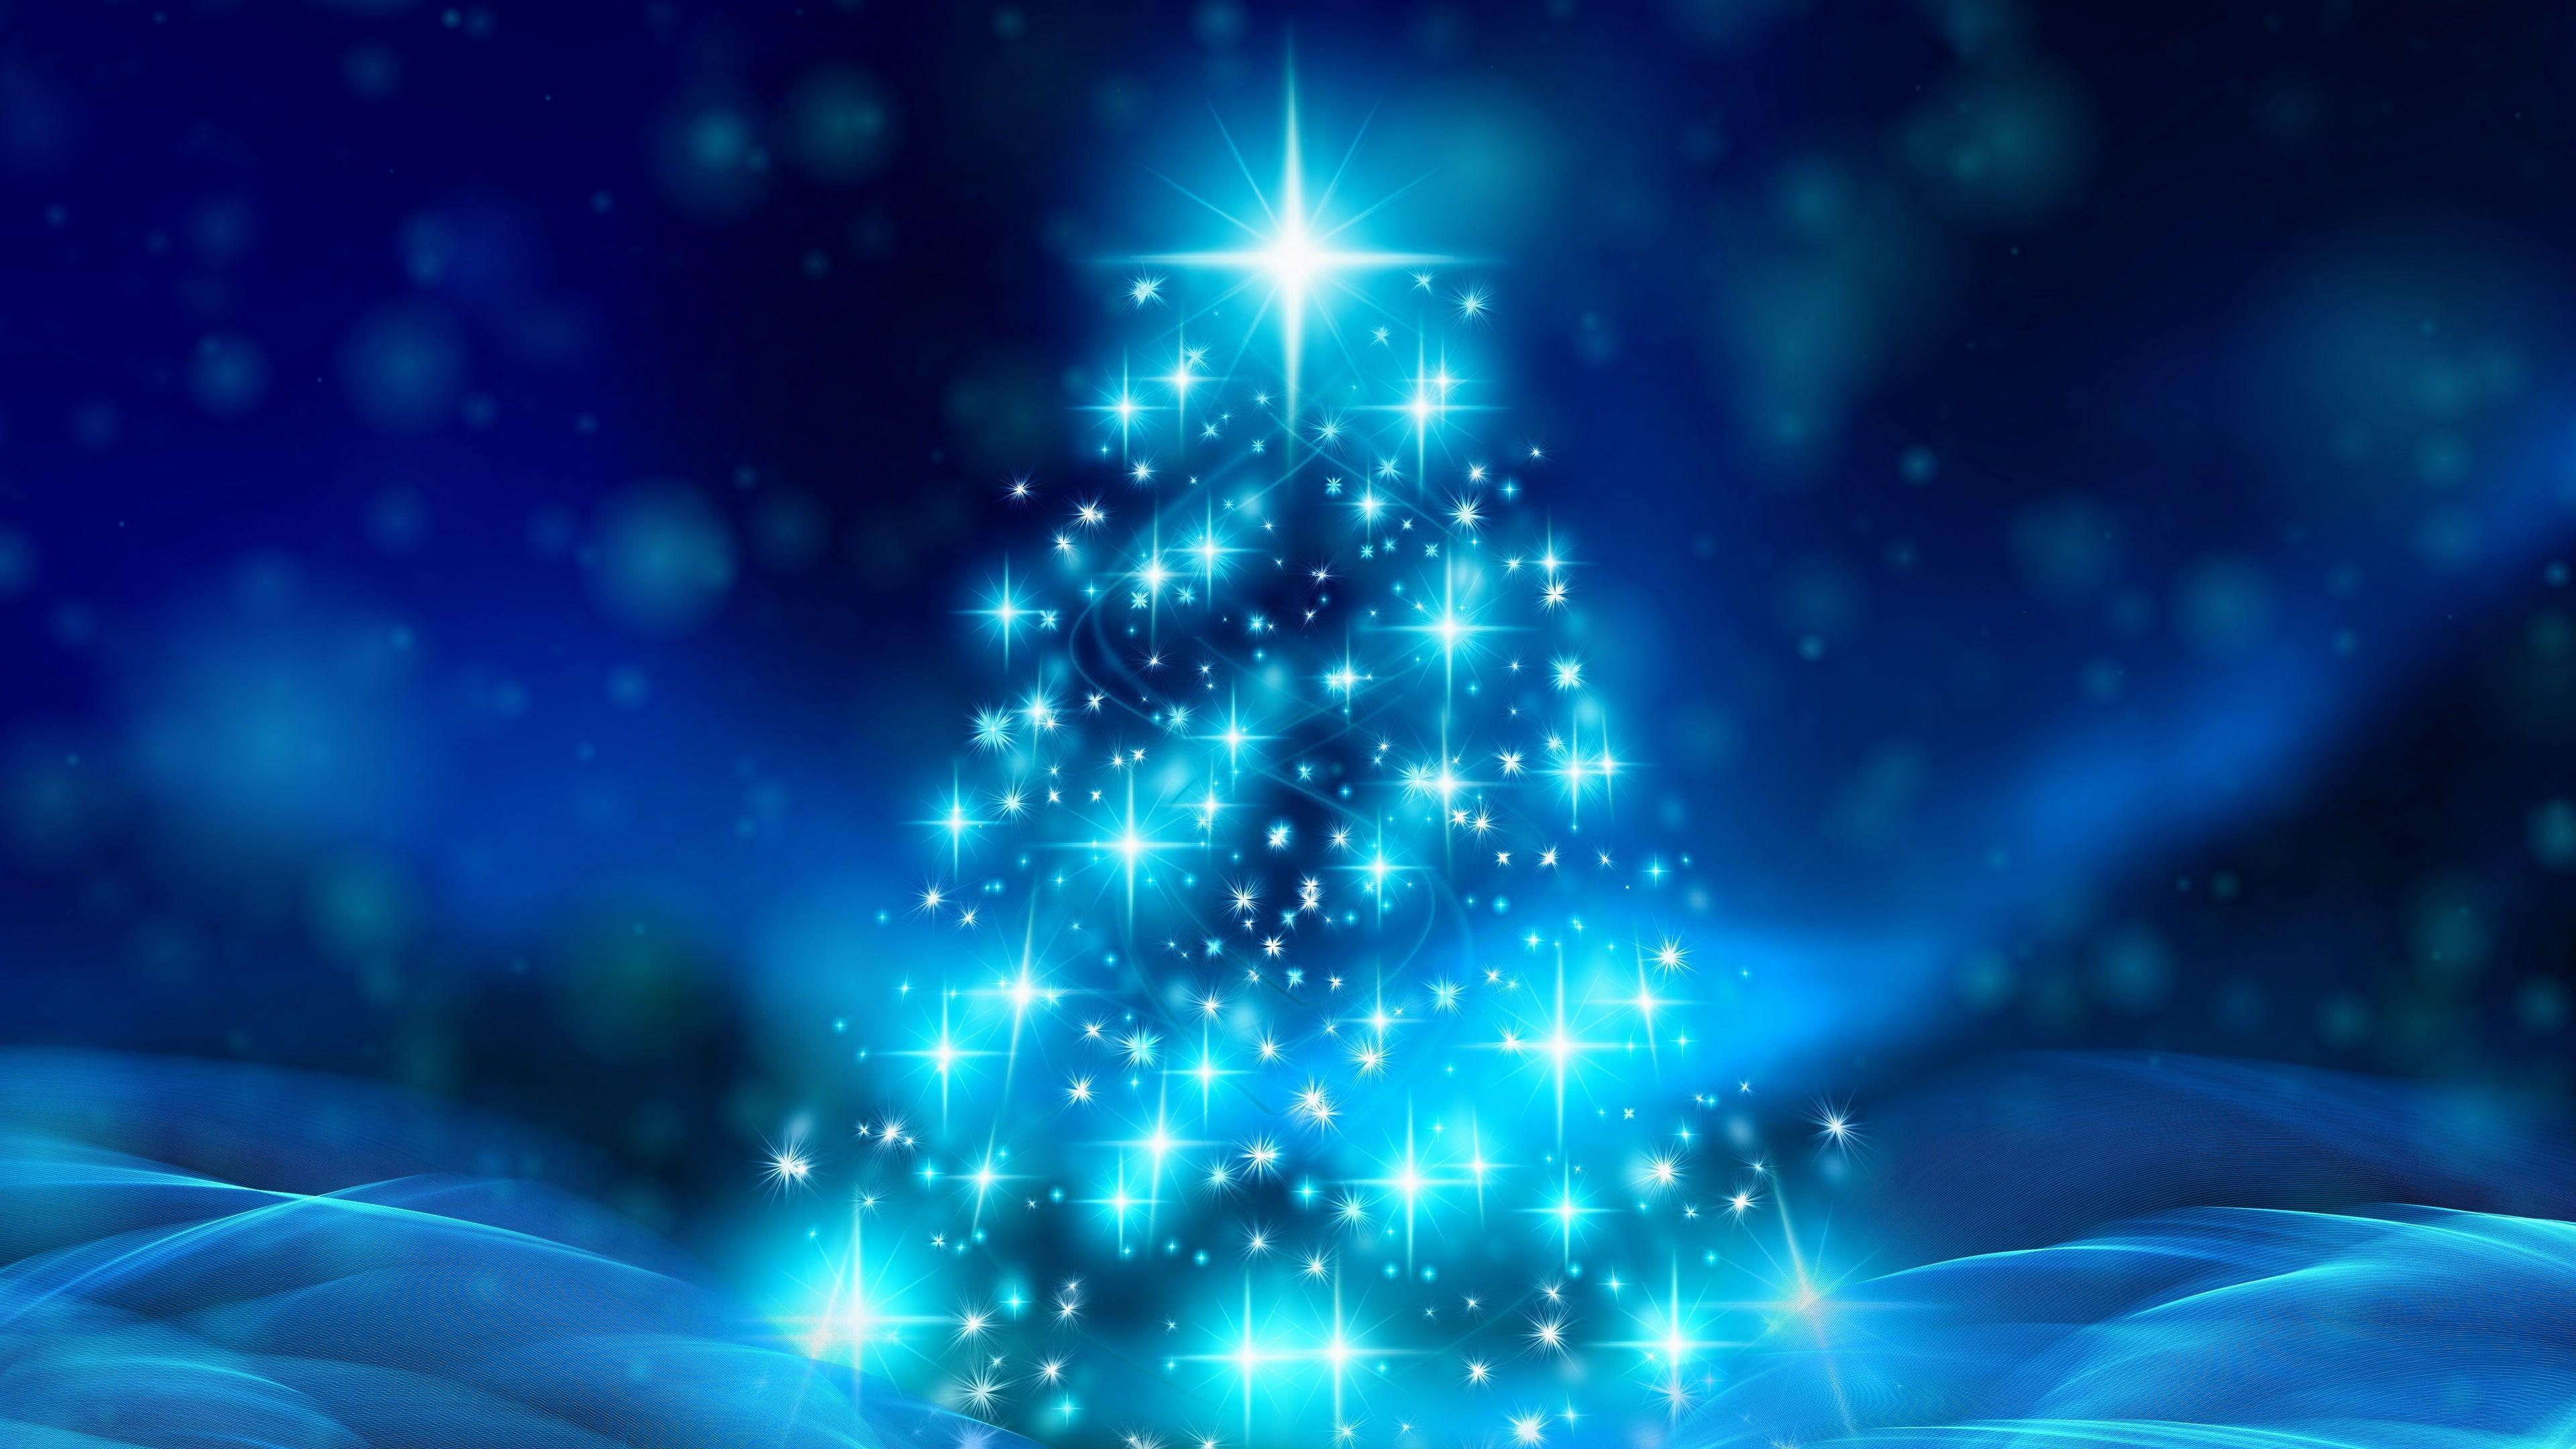 Blue Christmas Christmas Tree Stars Glow Shine Shining Glowing Starry Xmas 4k Wallpaper Hdwallpaper Holiday Wallpaper Wallpaper Christmas Wallpaper